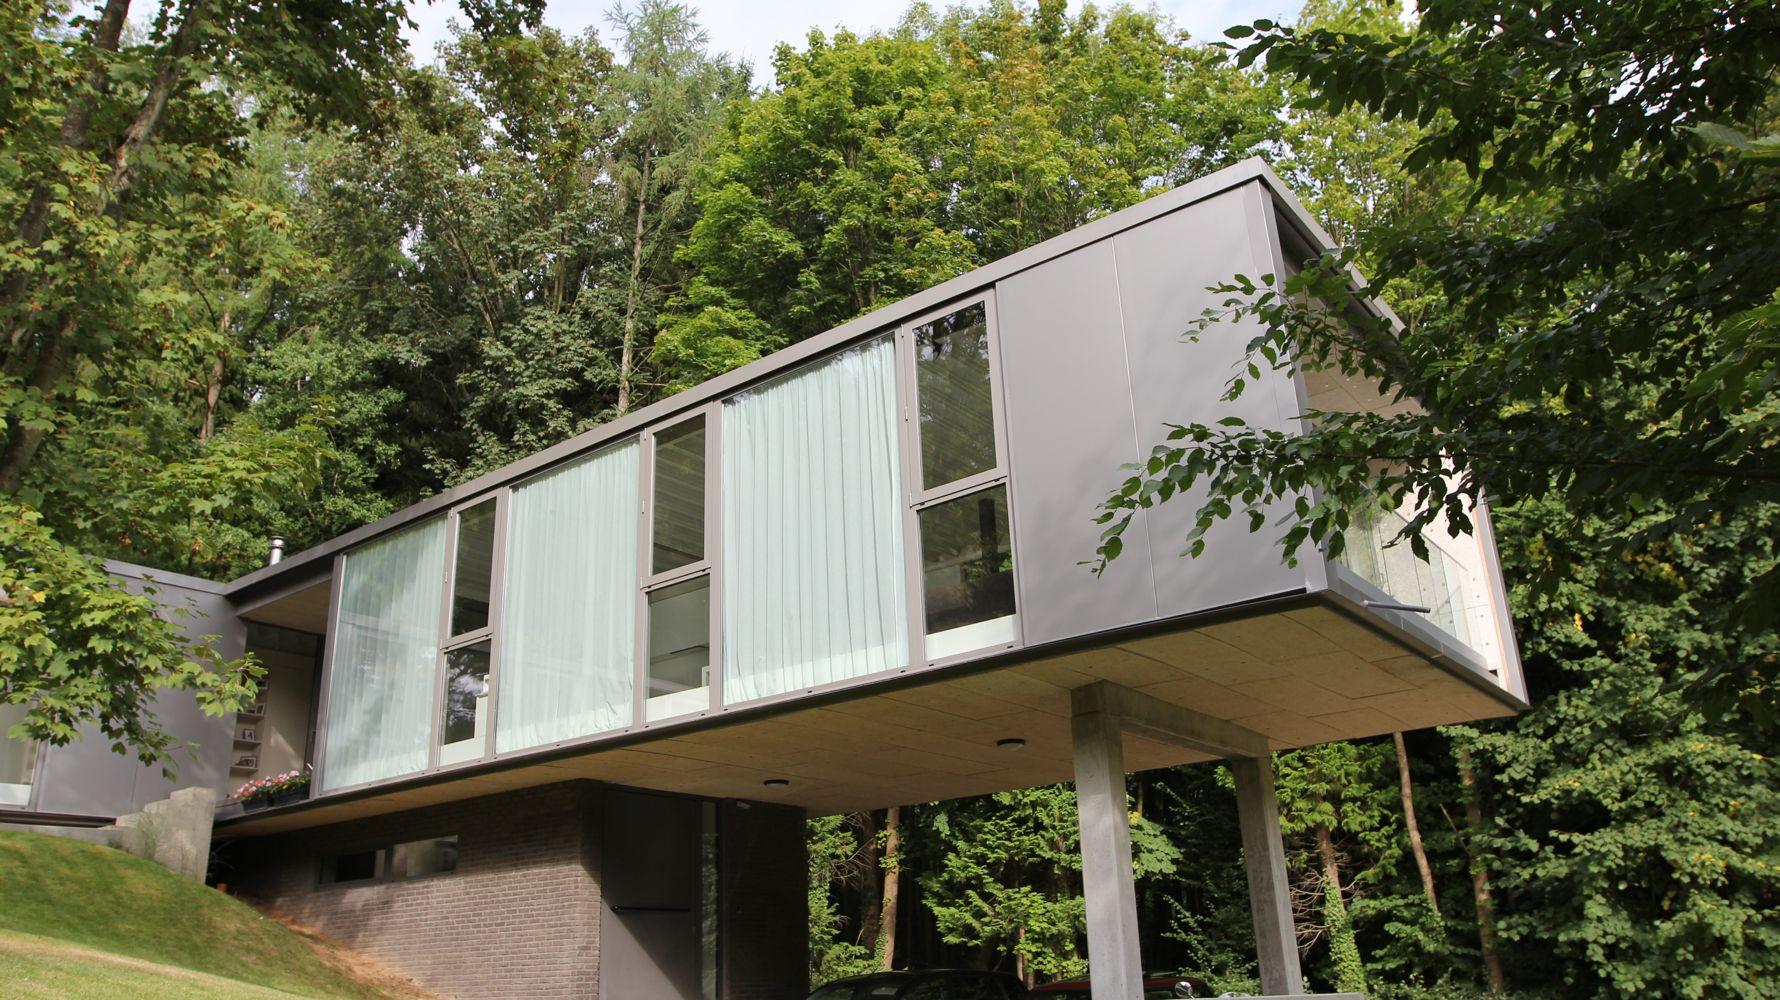 archi urbain visions architecturales et urbanistiques. Black Bedroom Furniture Sets. Home Design Ideas